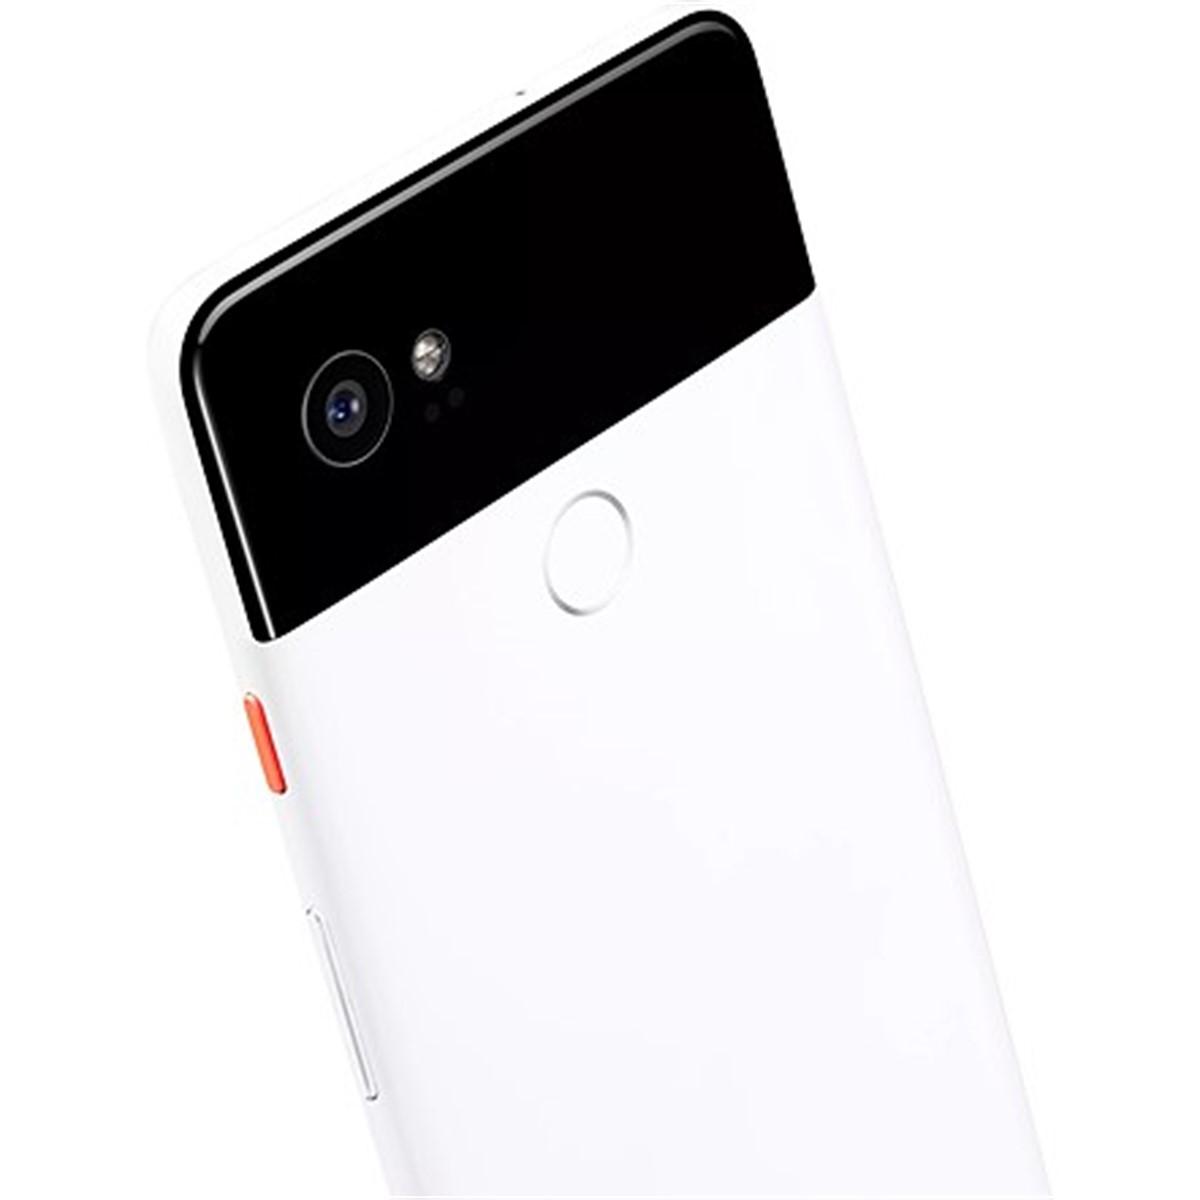 Google Camera mod brings Pixel 2 portrait mode to older devices